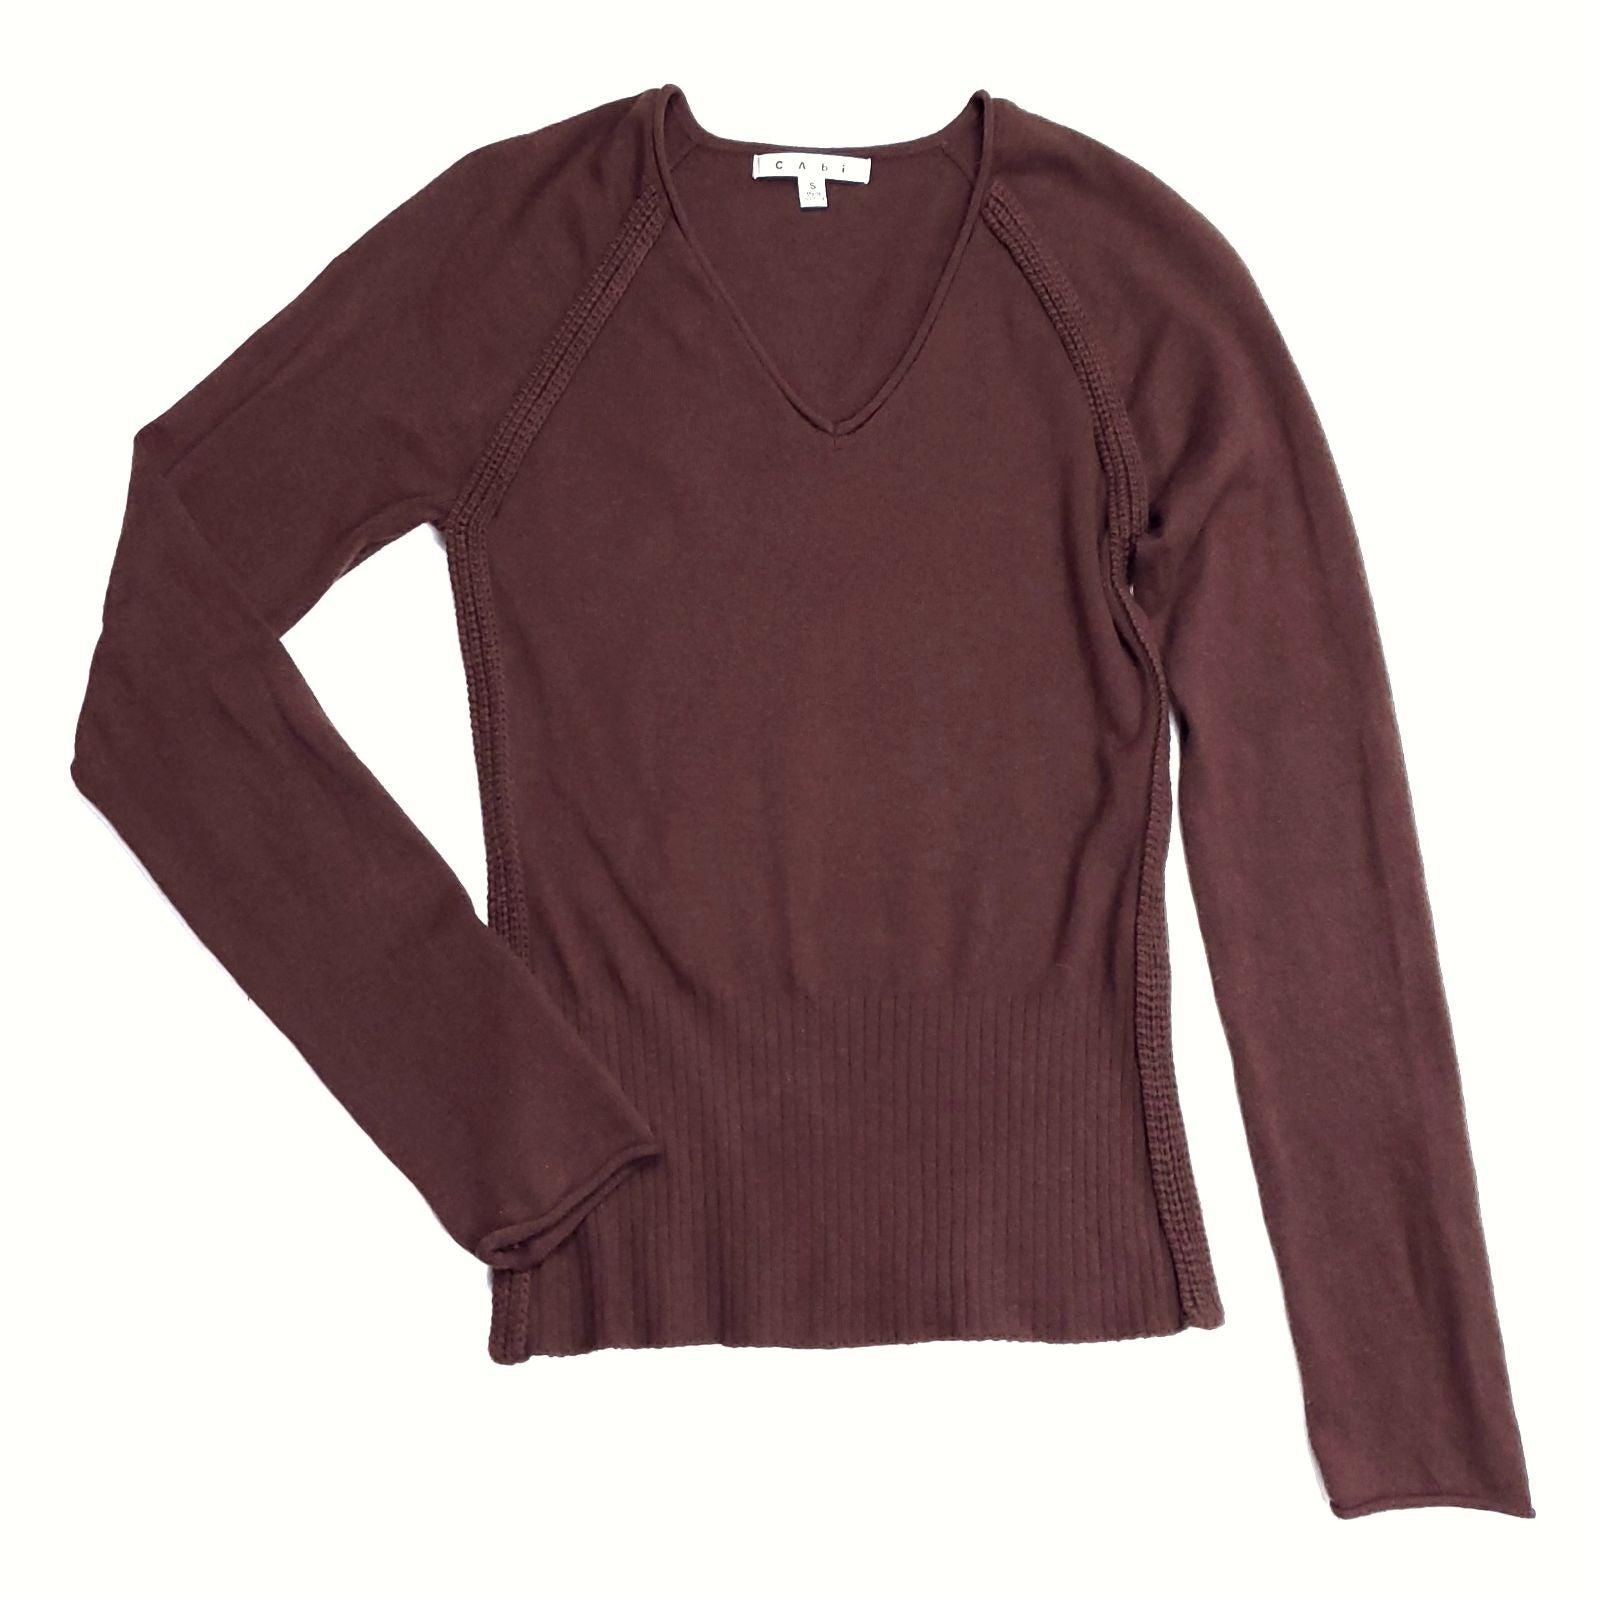 CAbi Brown V-neck Pullover Sweater Small